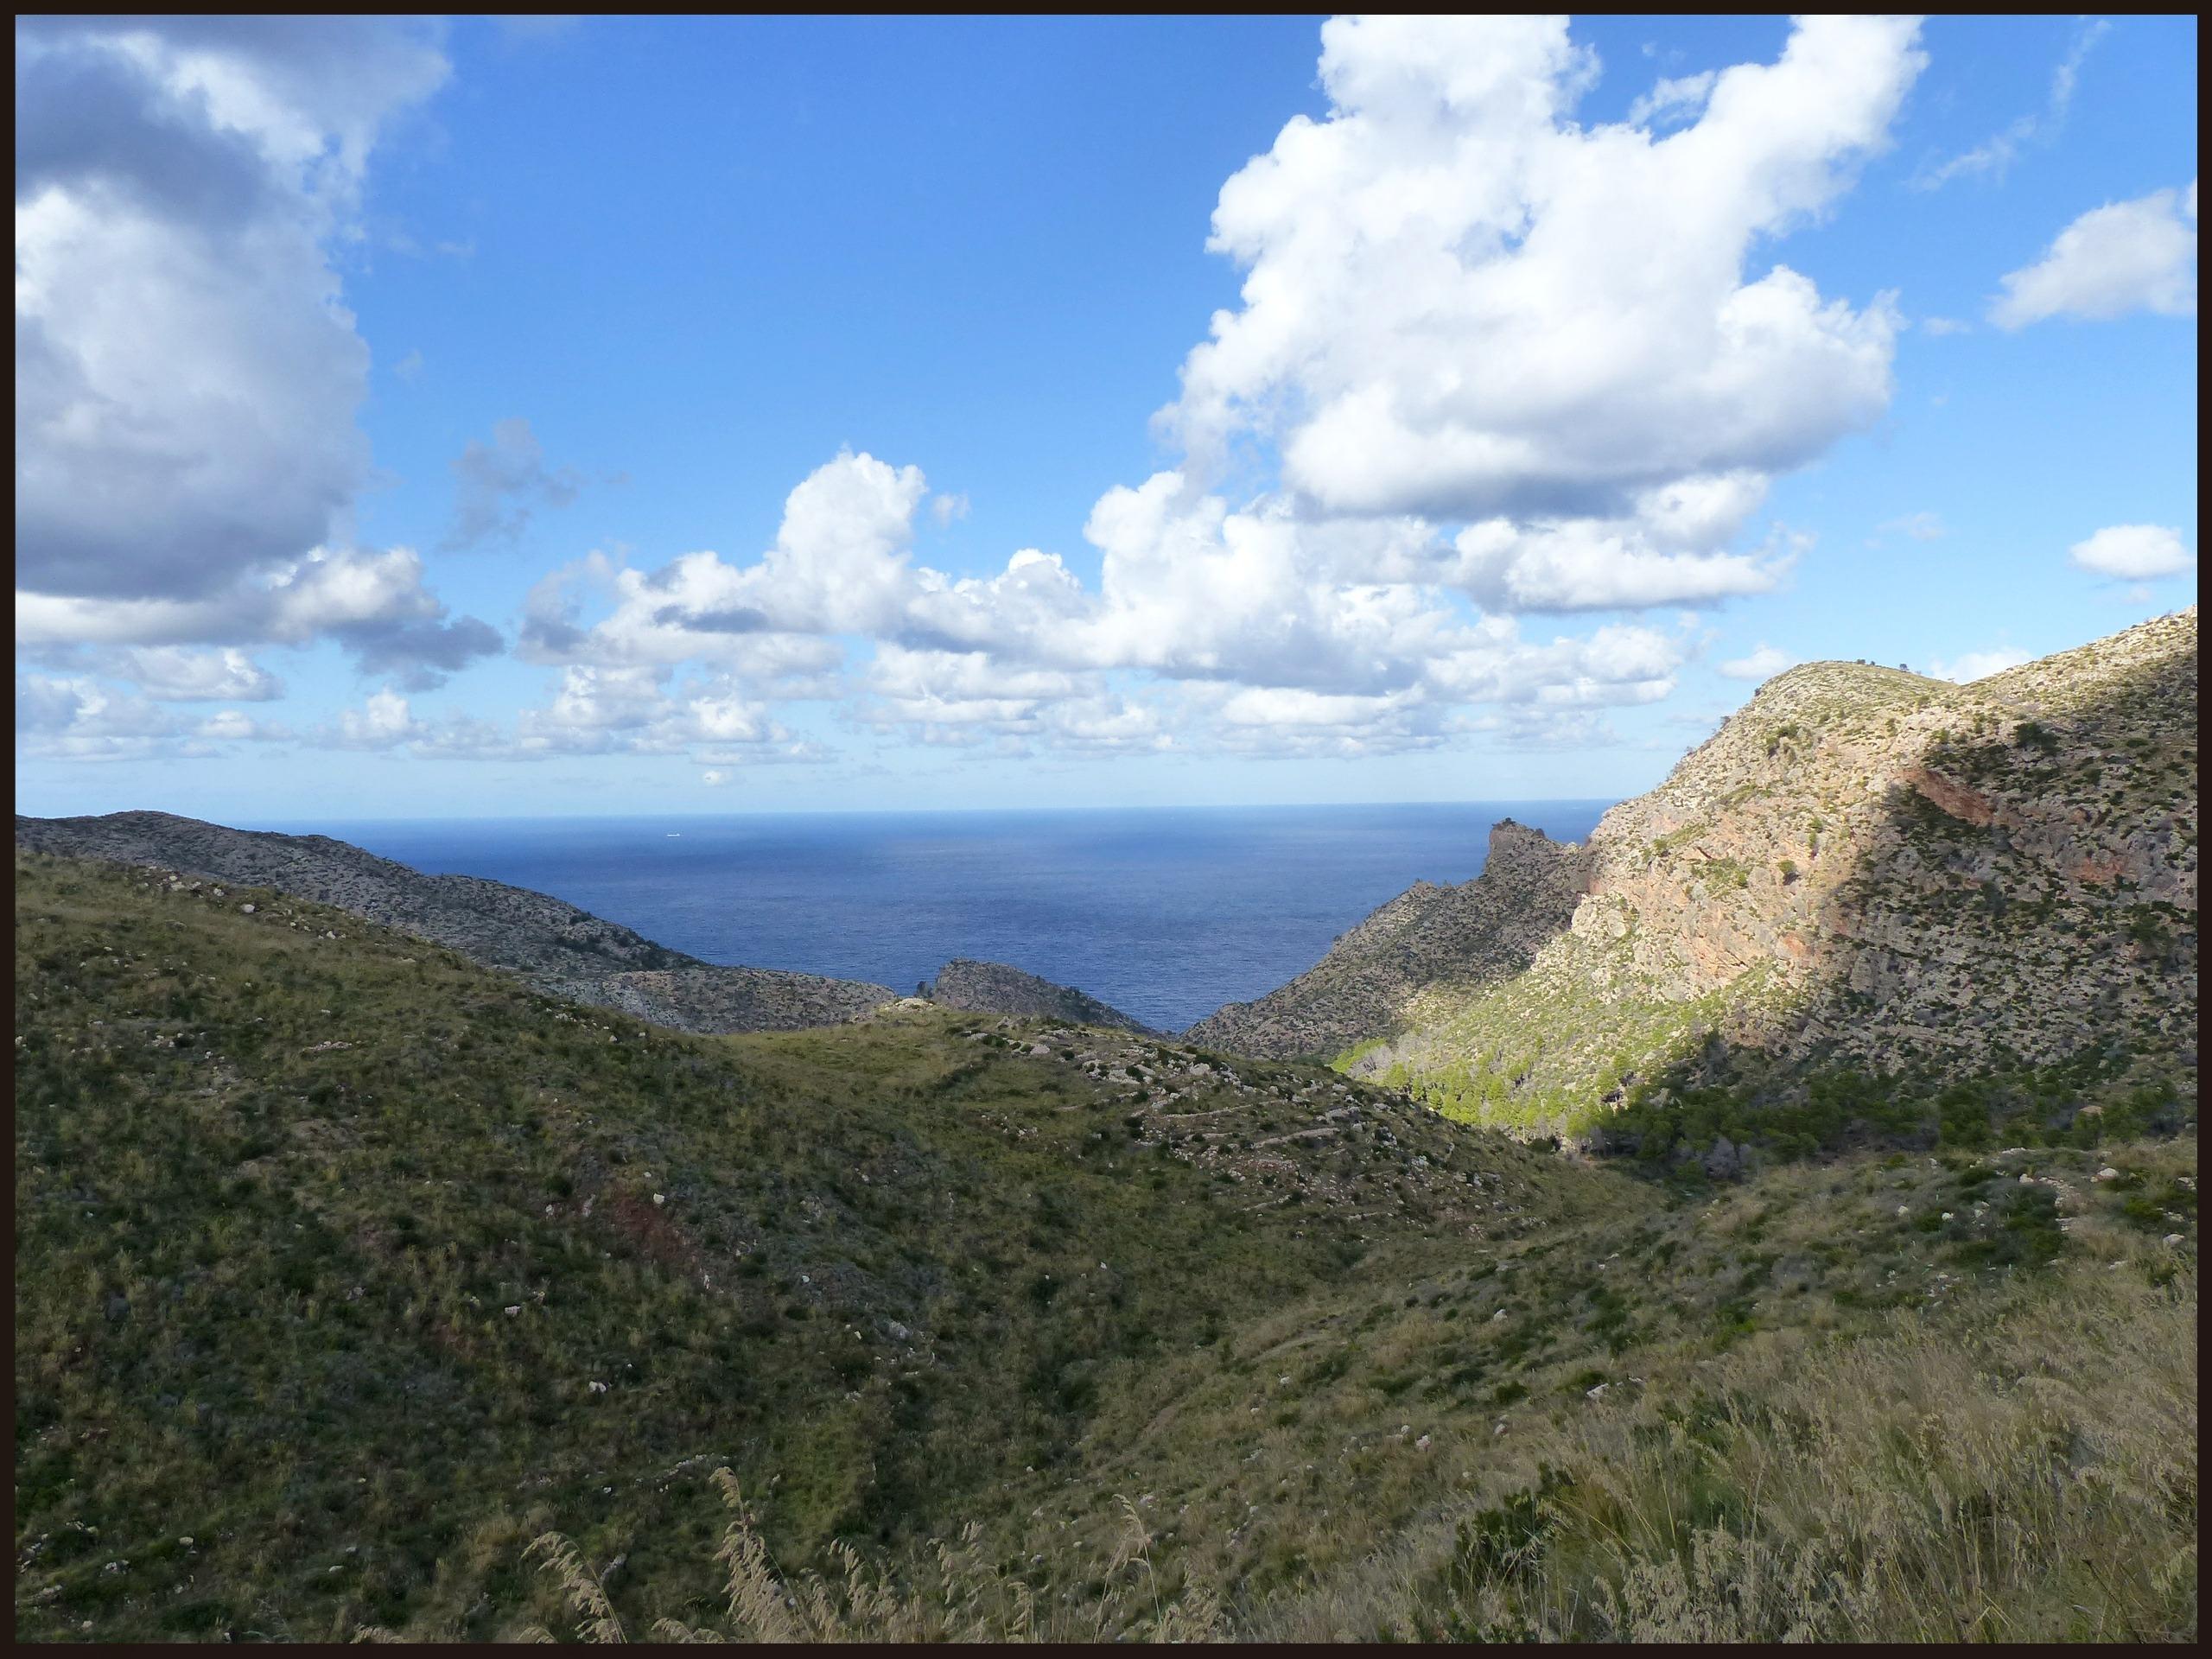 Road to Estellencs